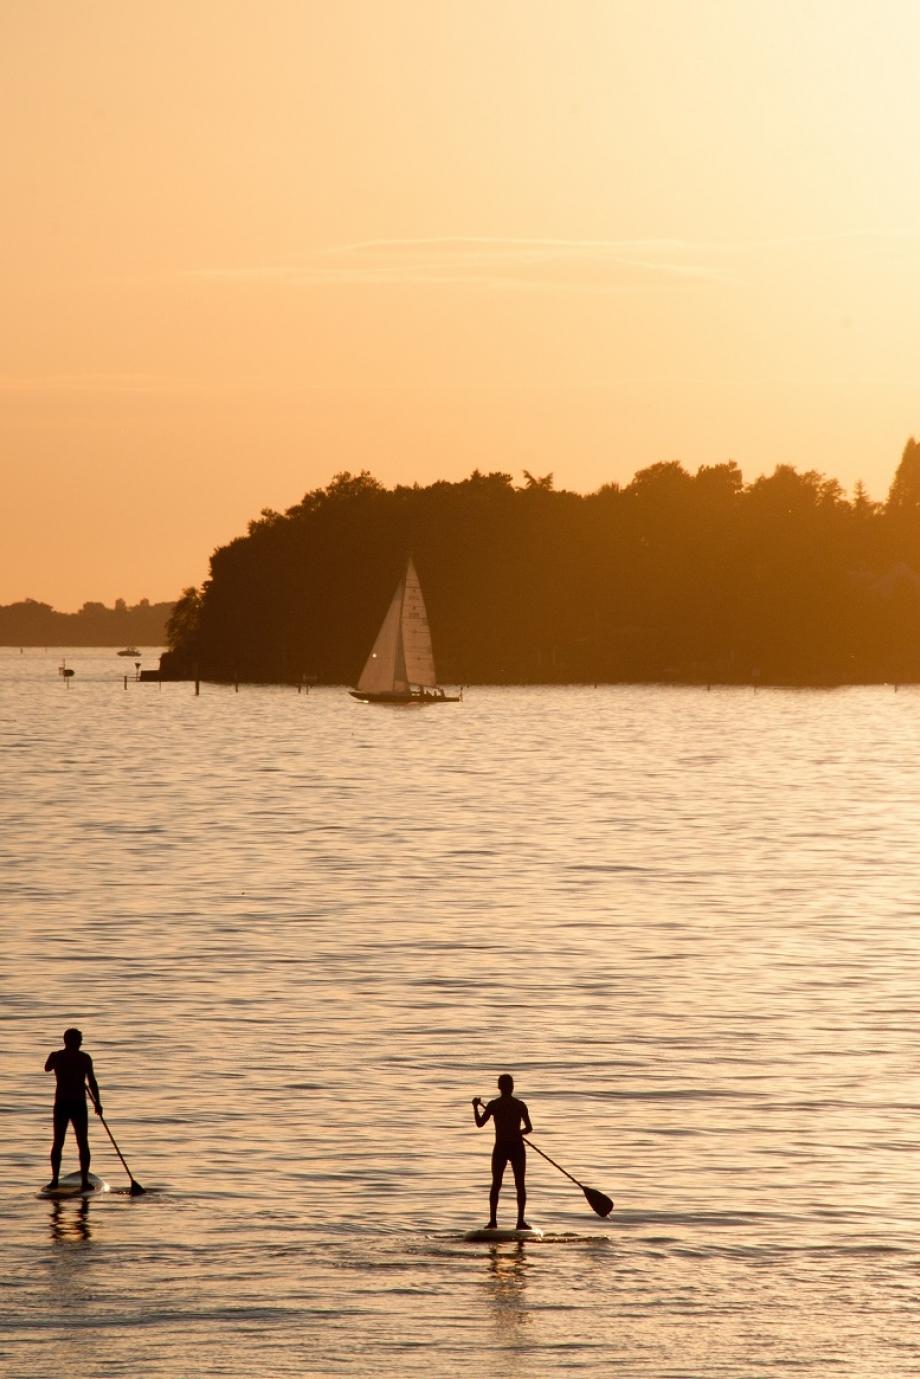 LisboaCool_Blog_Aqui Perto: Sunset Paddle na Lagoa de Óbidos